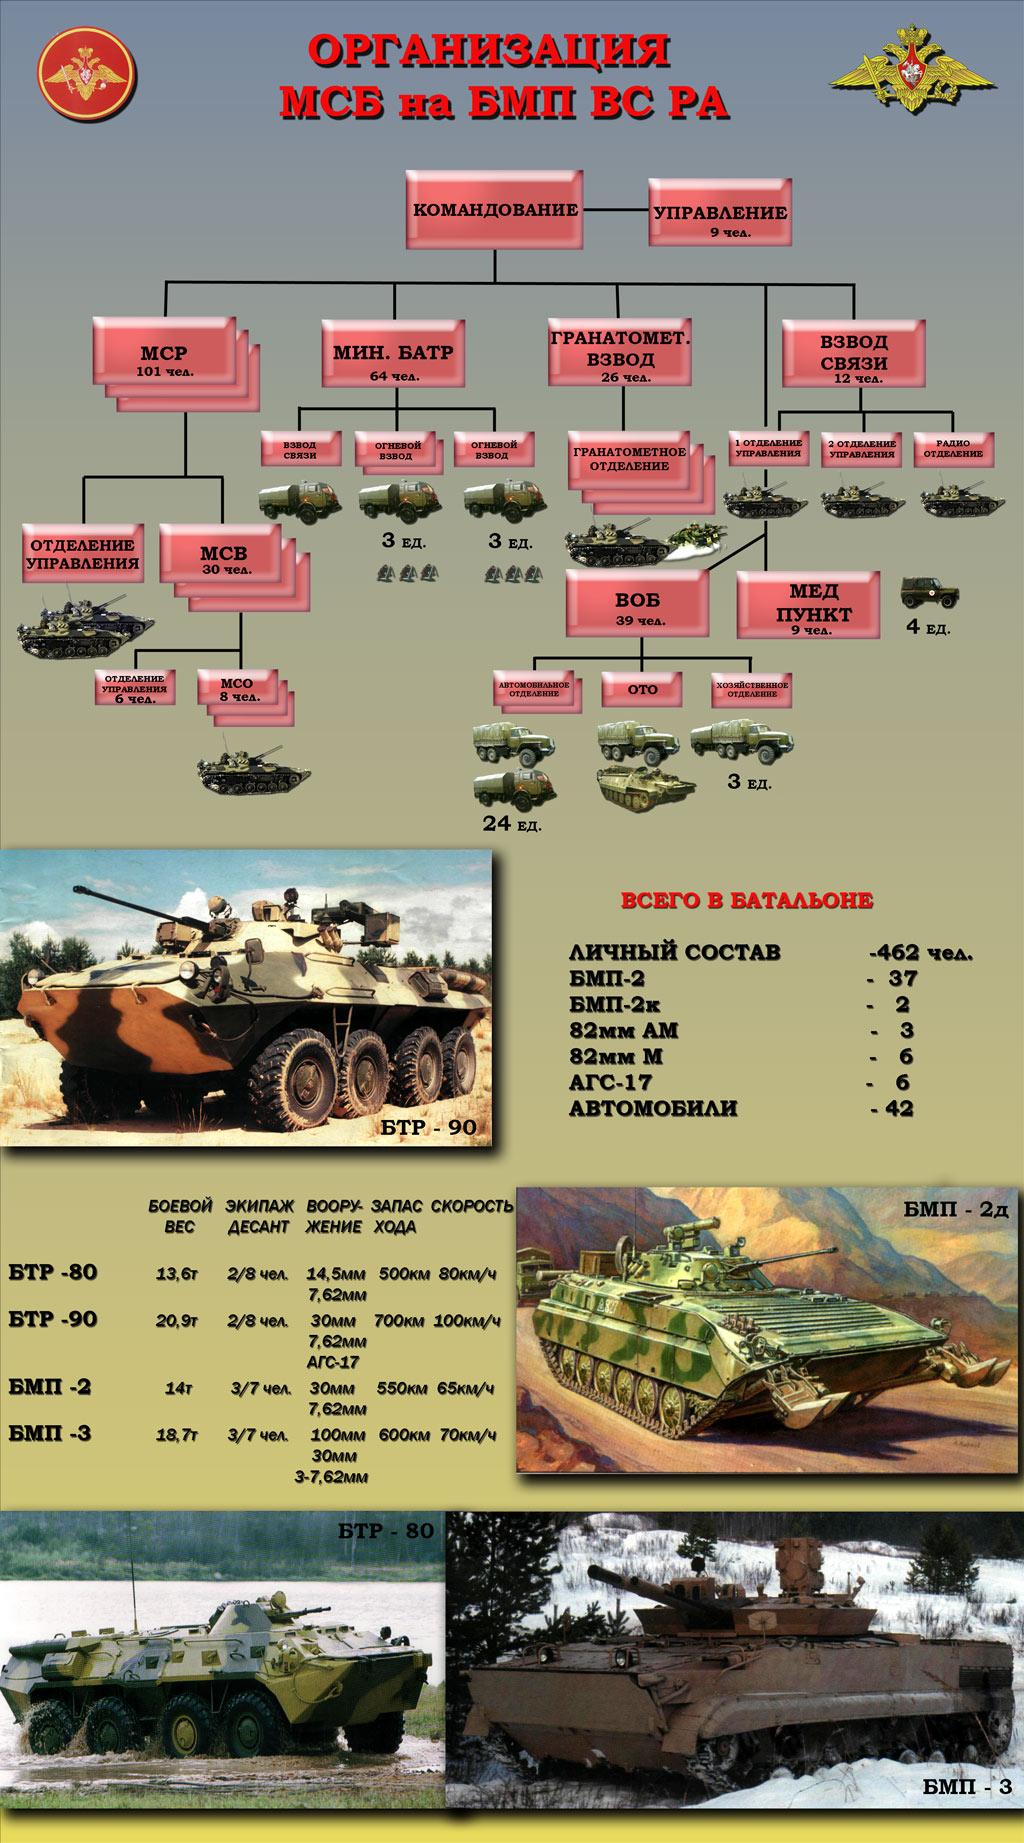 3 танковый батальон: